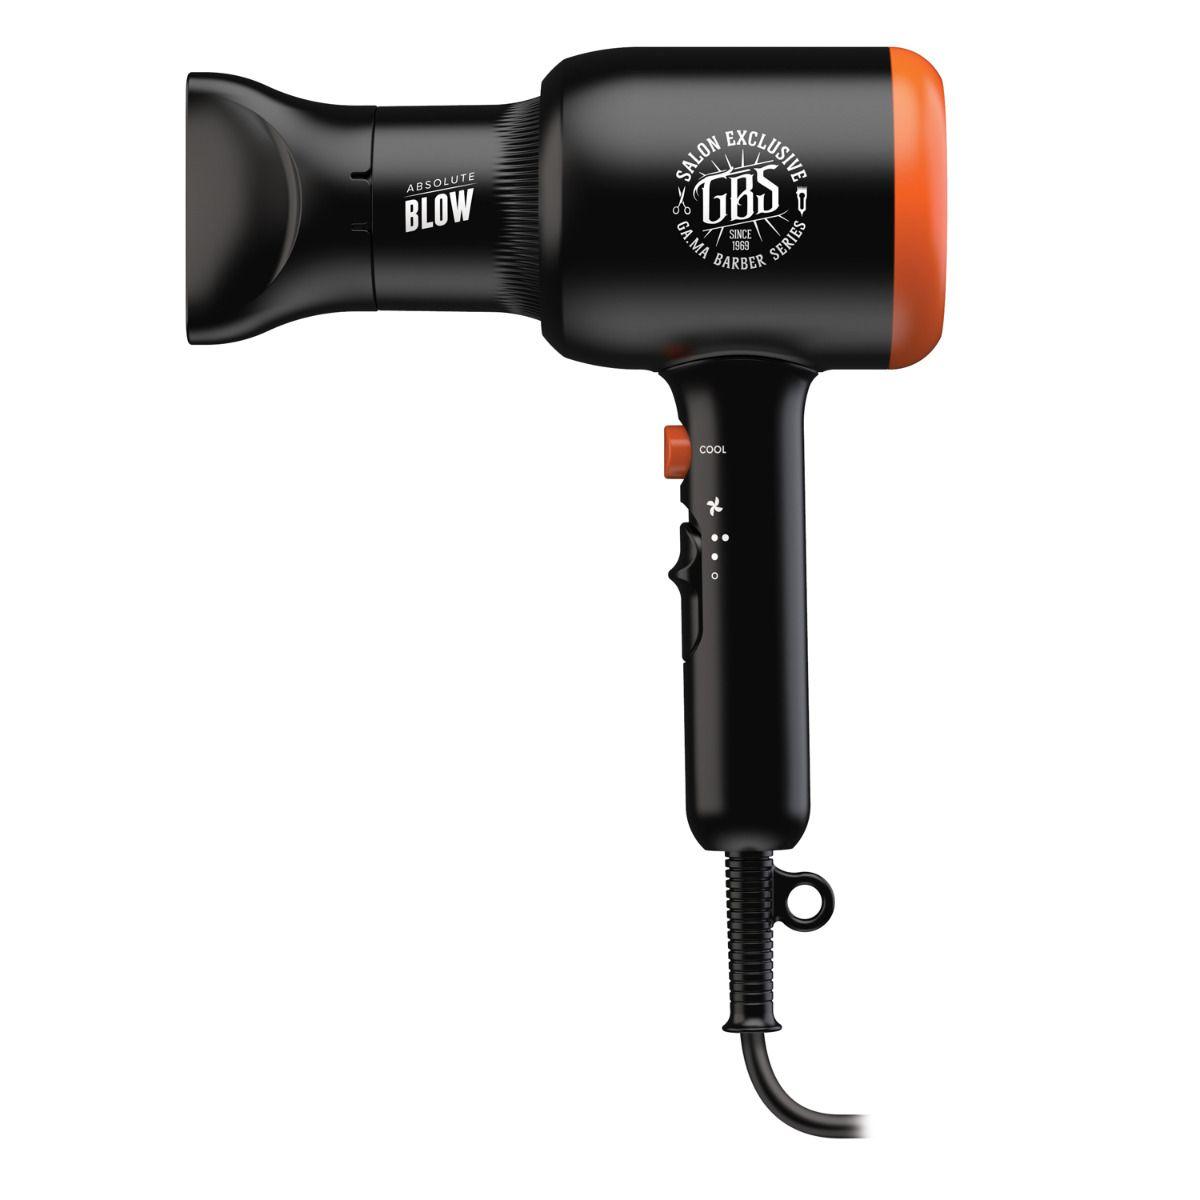 GA.MA GBS Absolute Blow 2290 - profesionálny barber fén